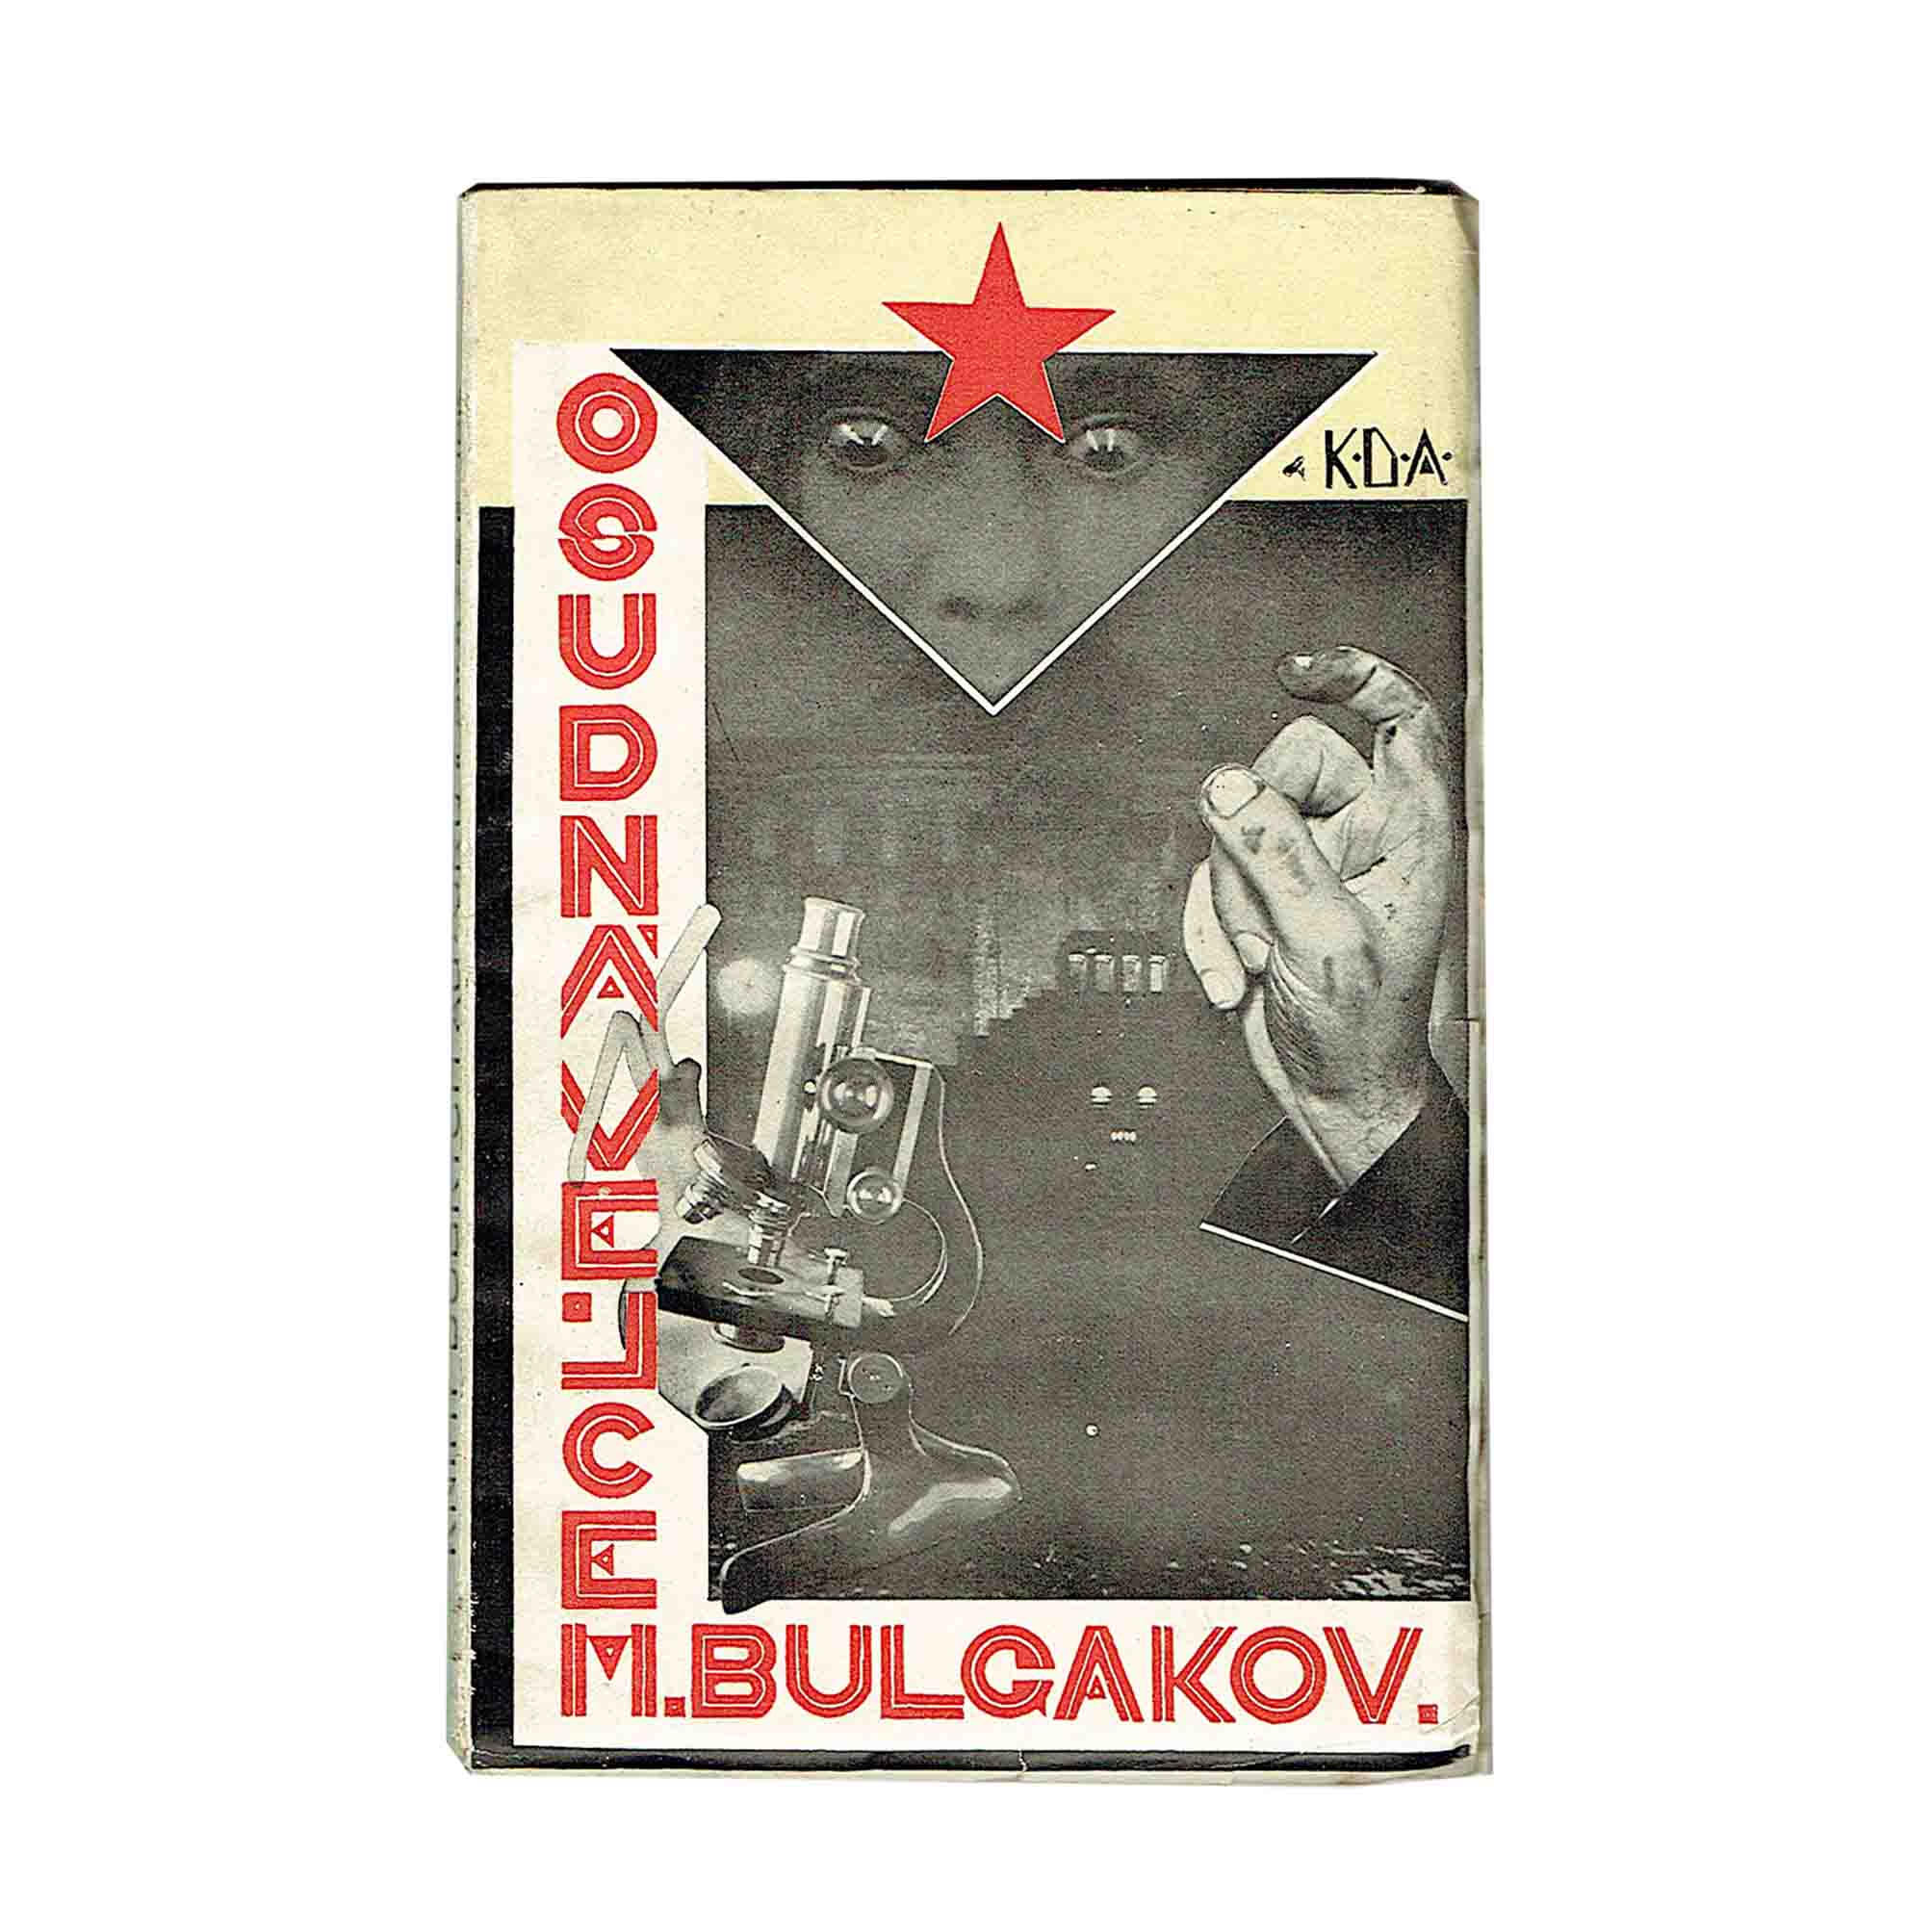 6092 Bulgakov Golovin Osudna 1929 A N